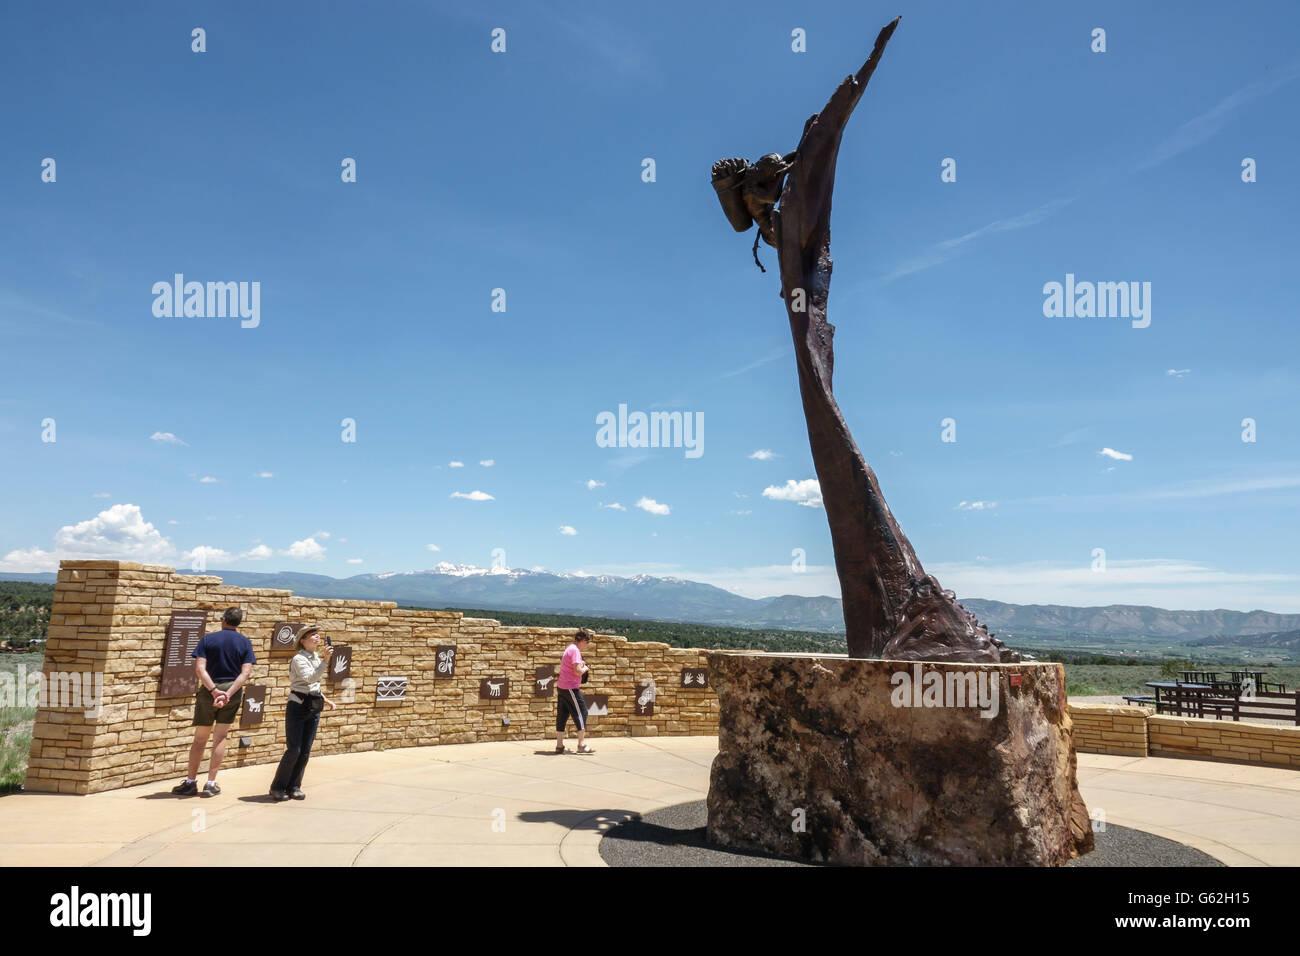 Mesa Verde national Park visitor center statue - Stock Image